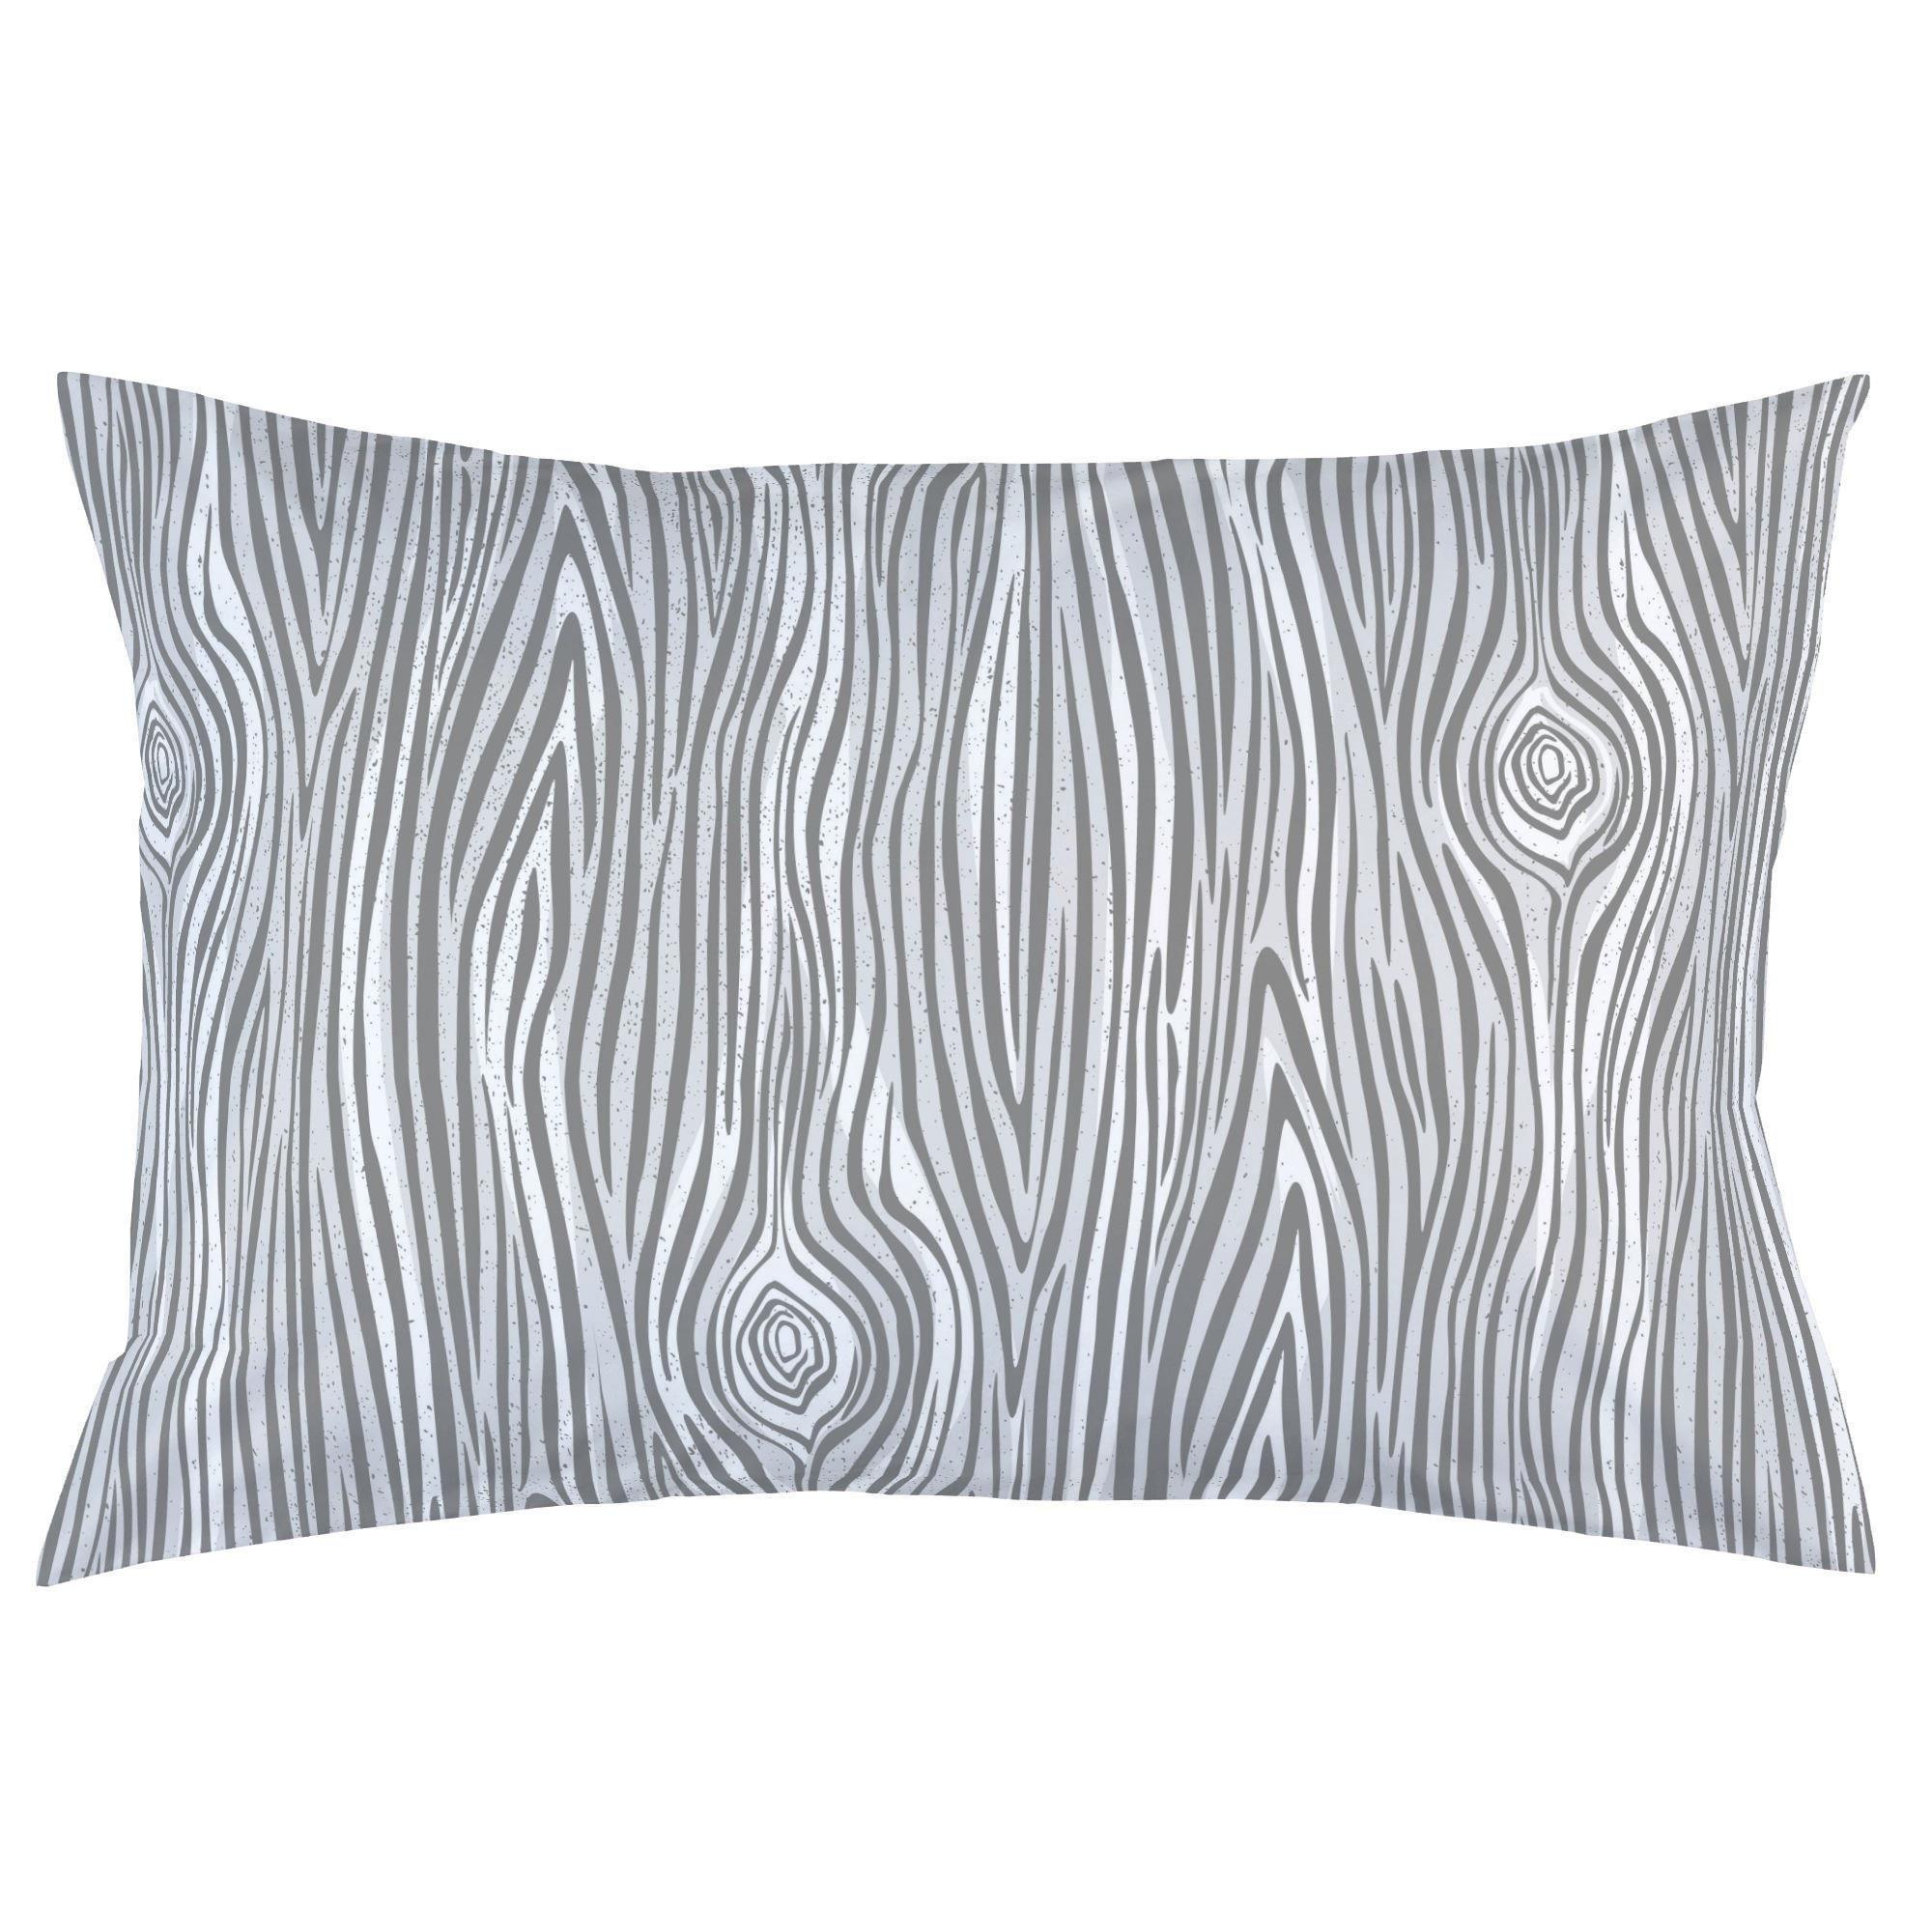 Carousel Designs Gray Large Woodgrain Pillow Case - Organic 100% Cotton Pillow Case - Made in the USA